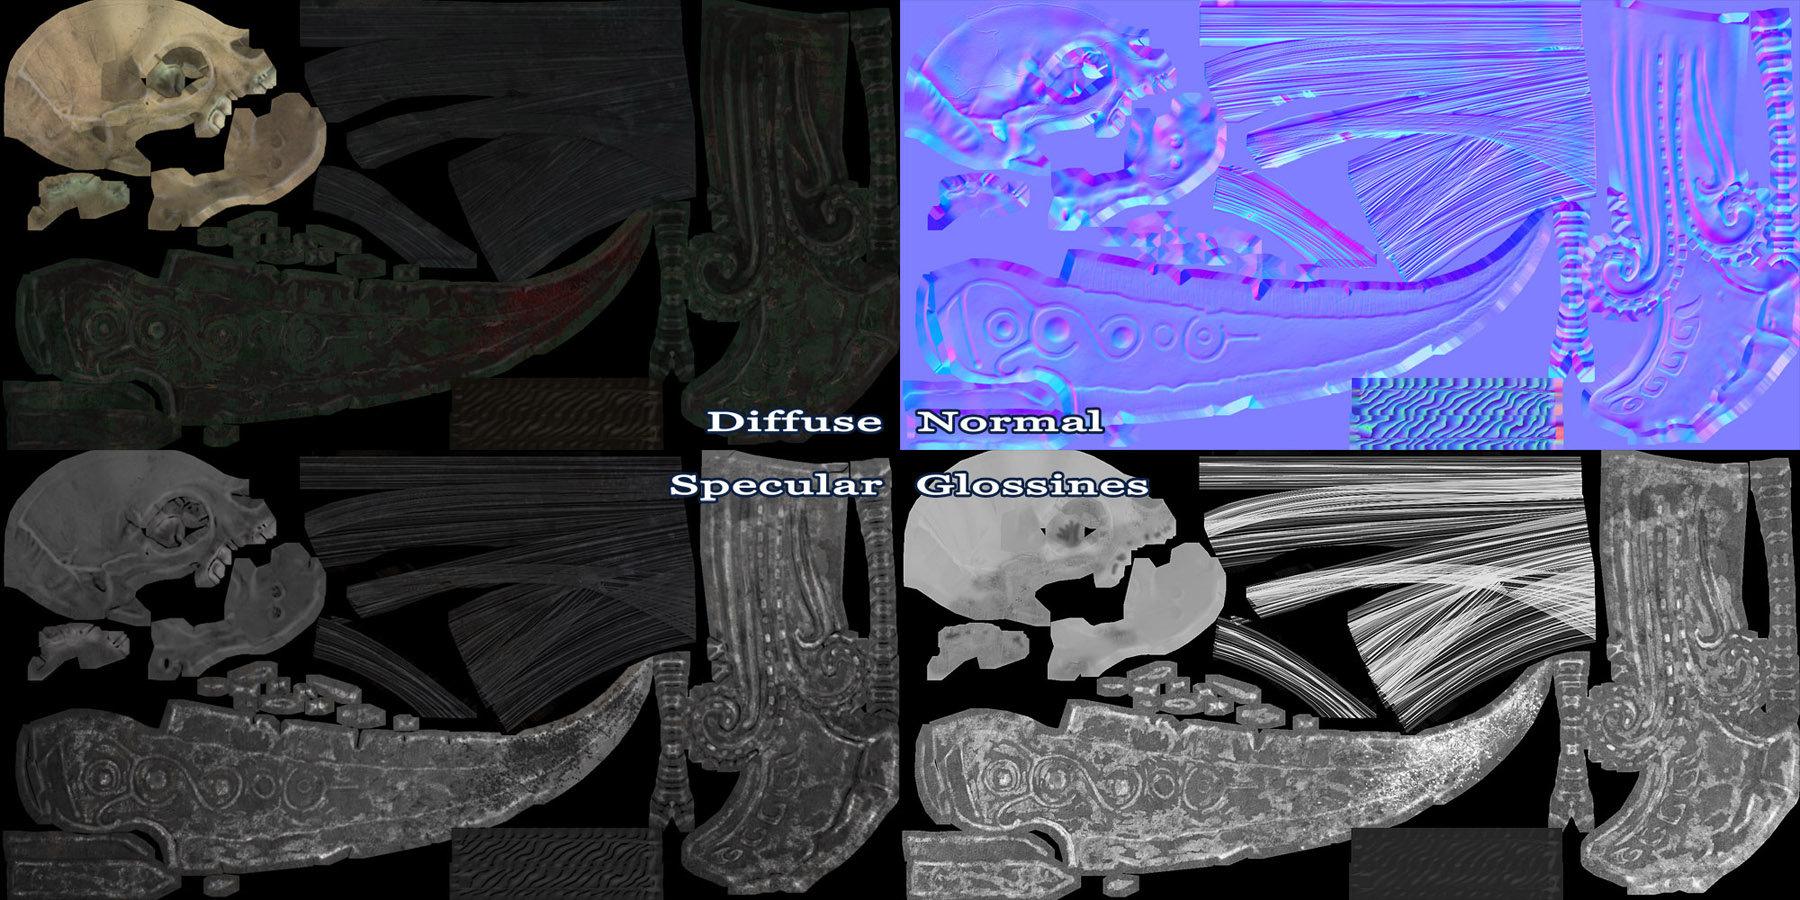 Georgian avasilcutei dagger textures